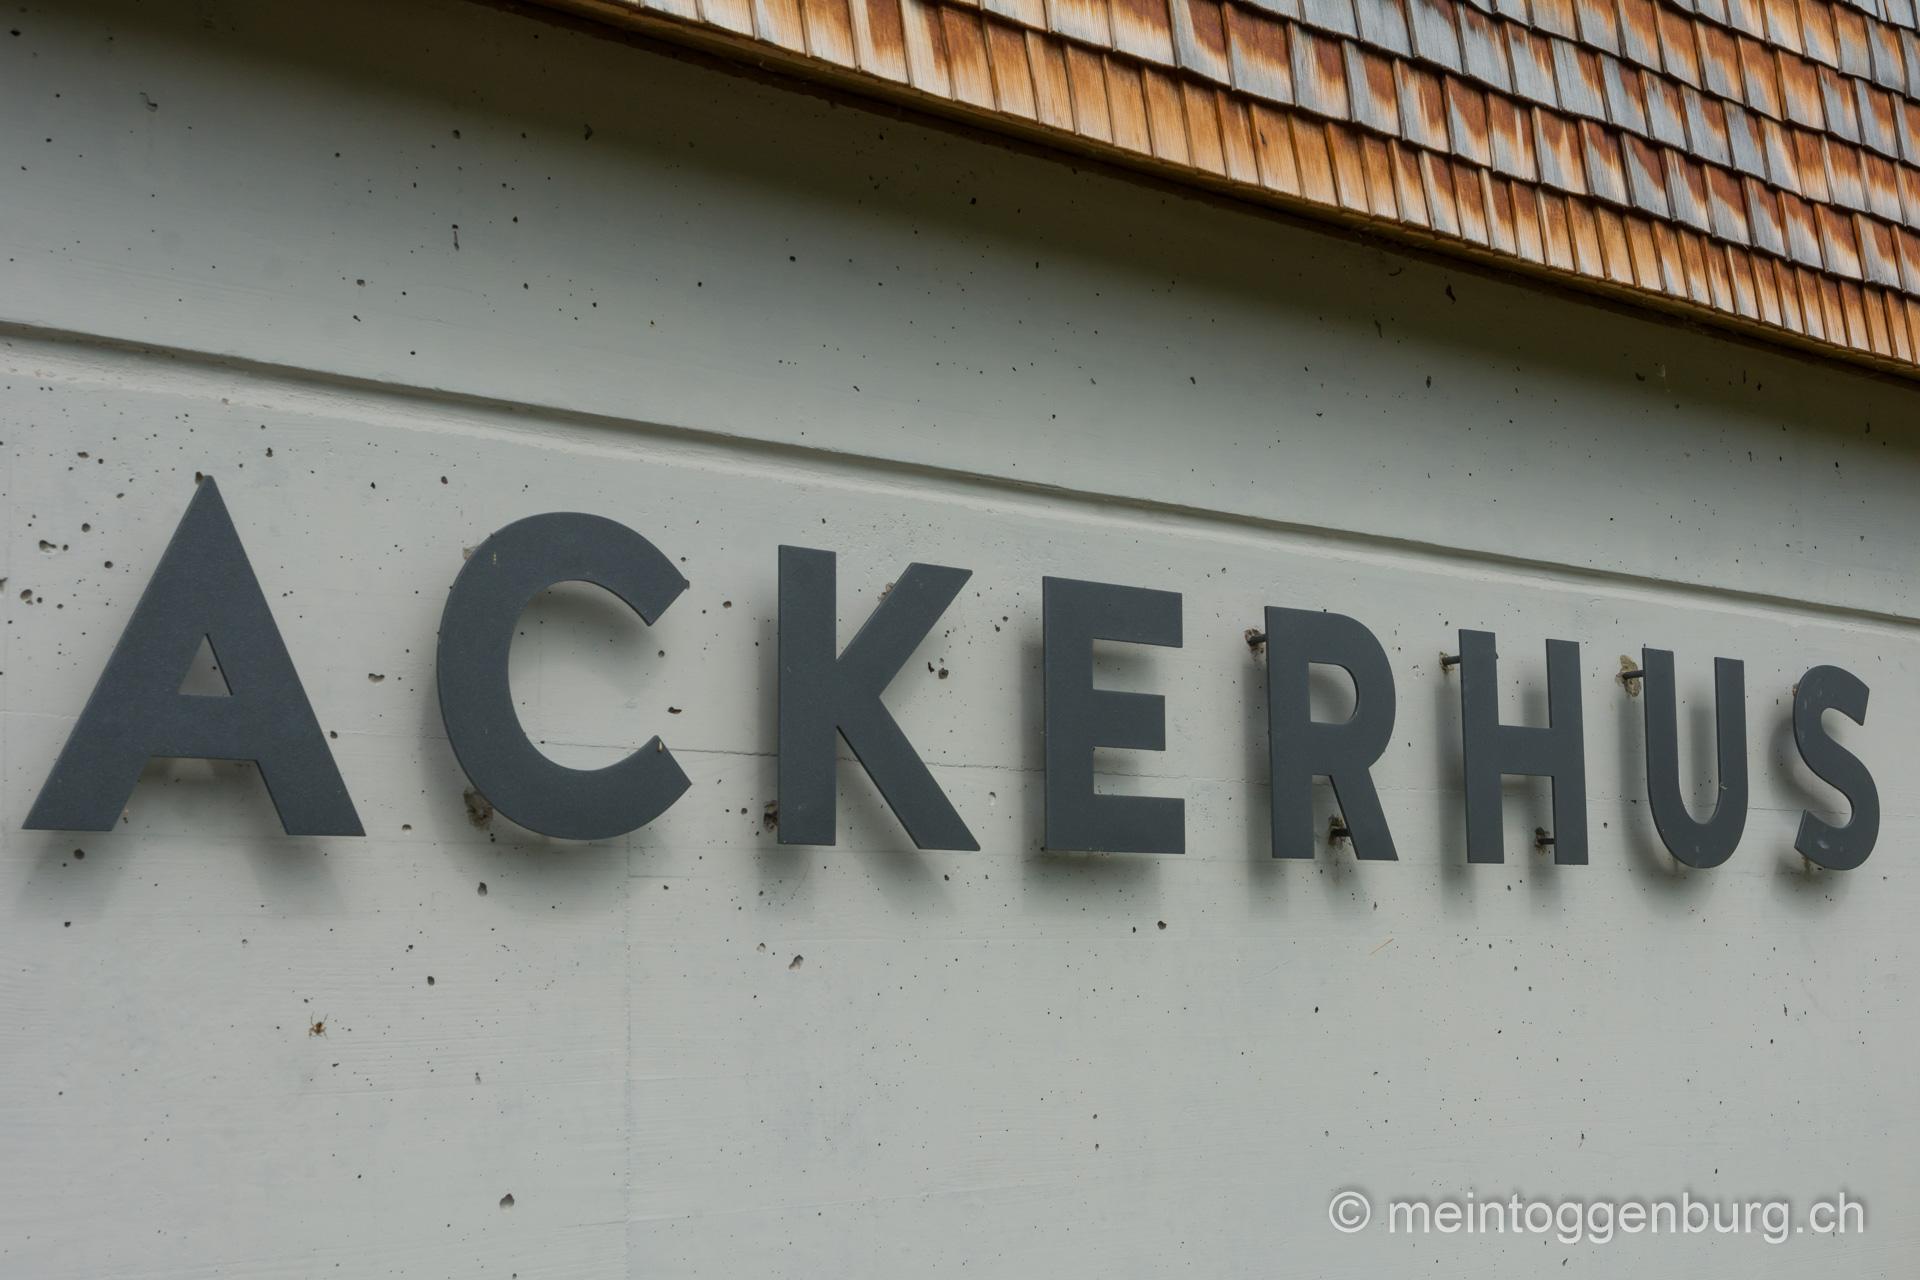 Ackerhus Ebnat-Kappel